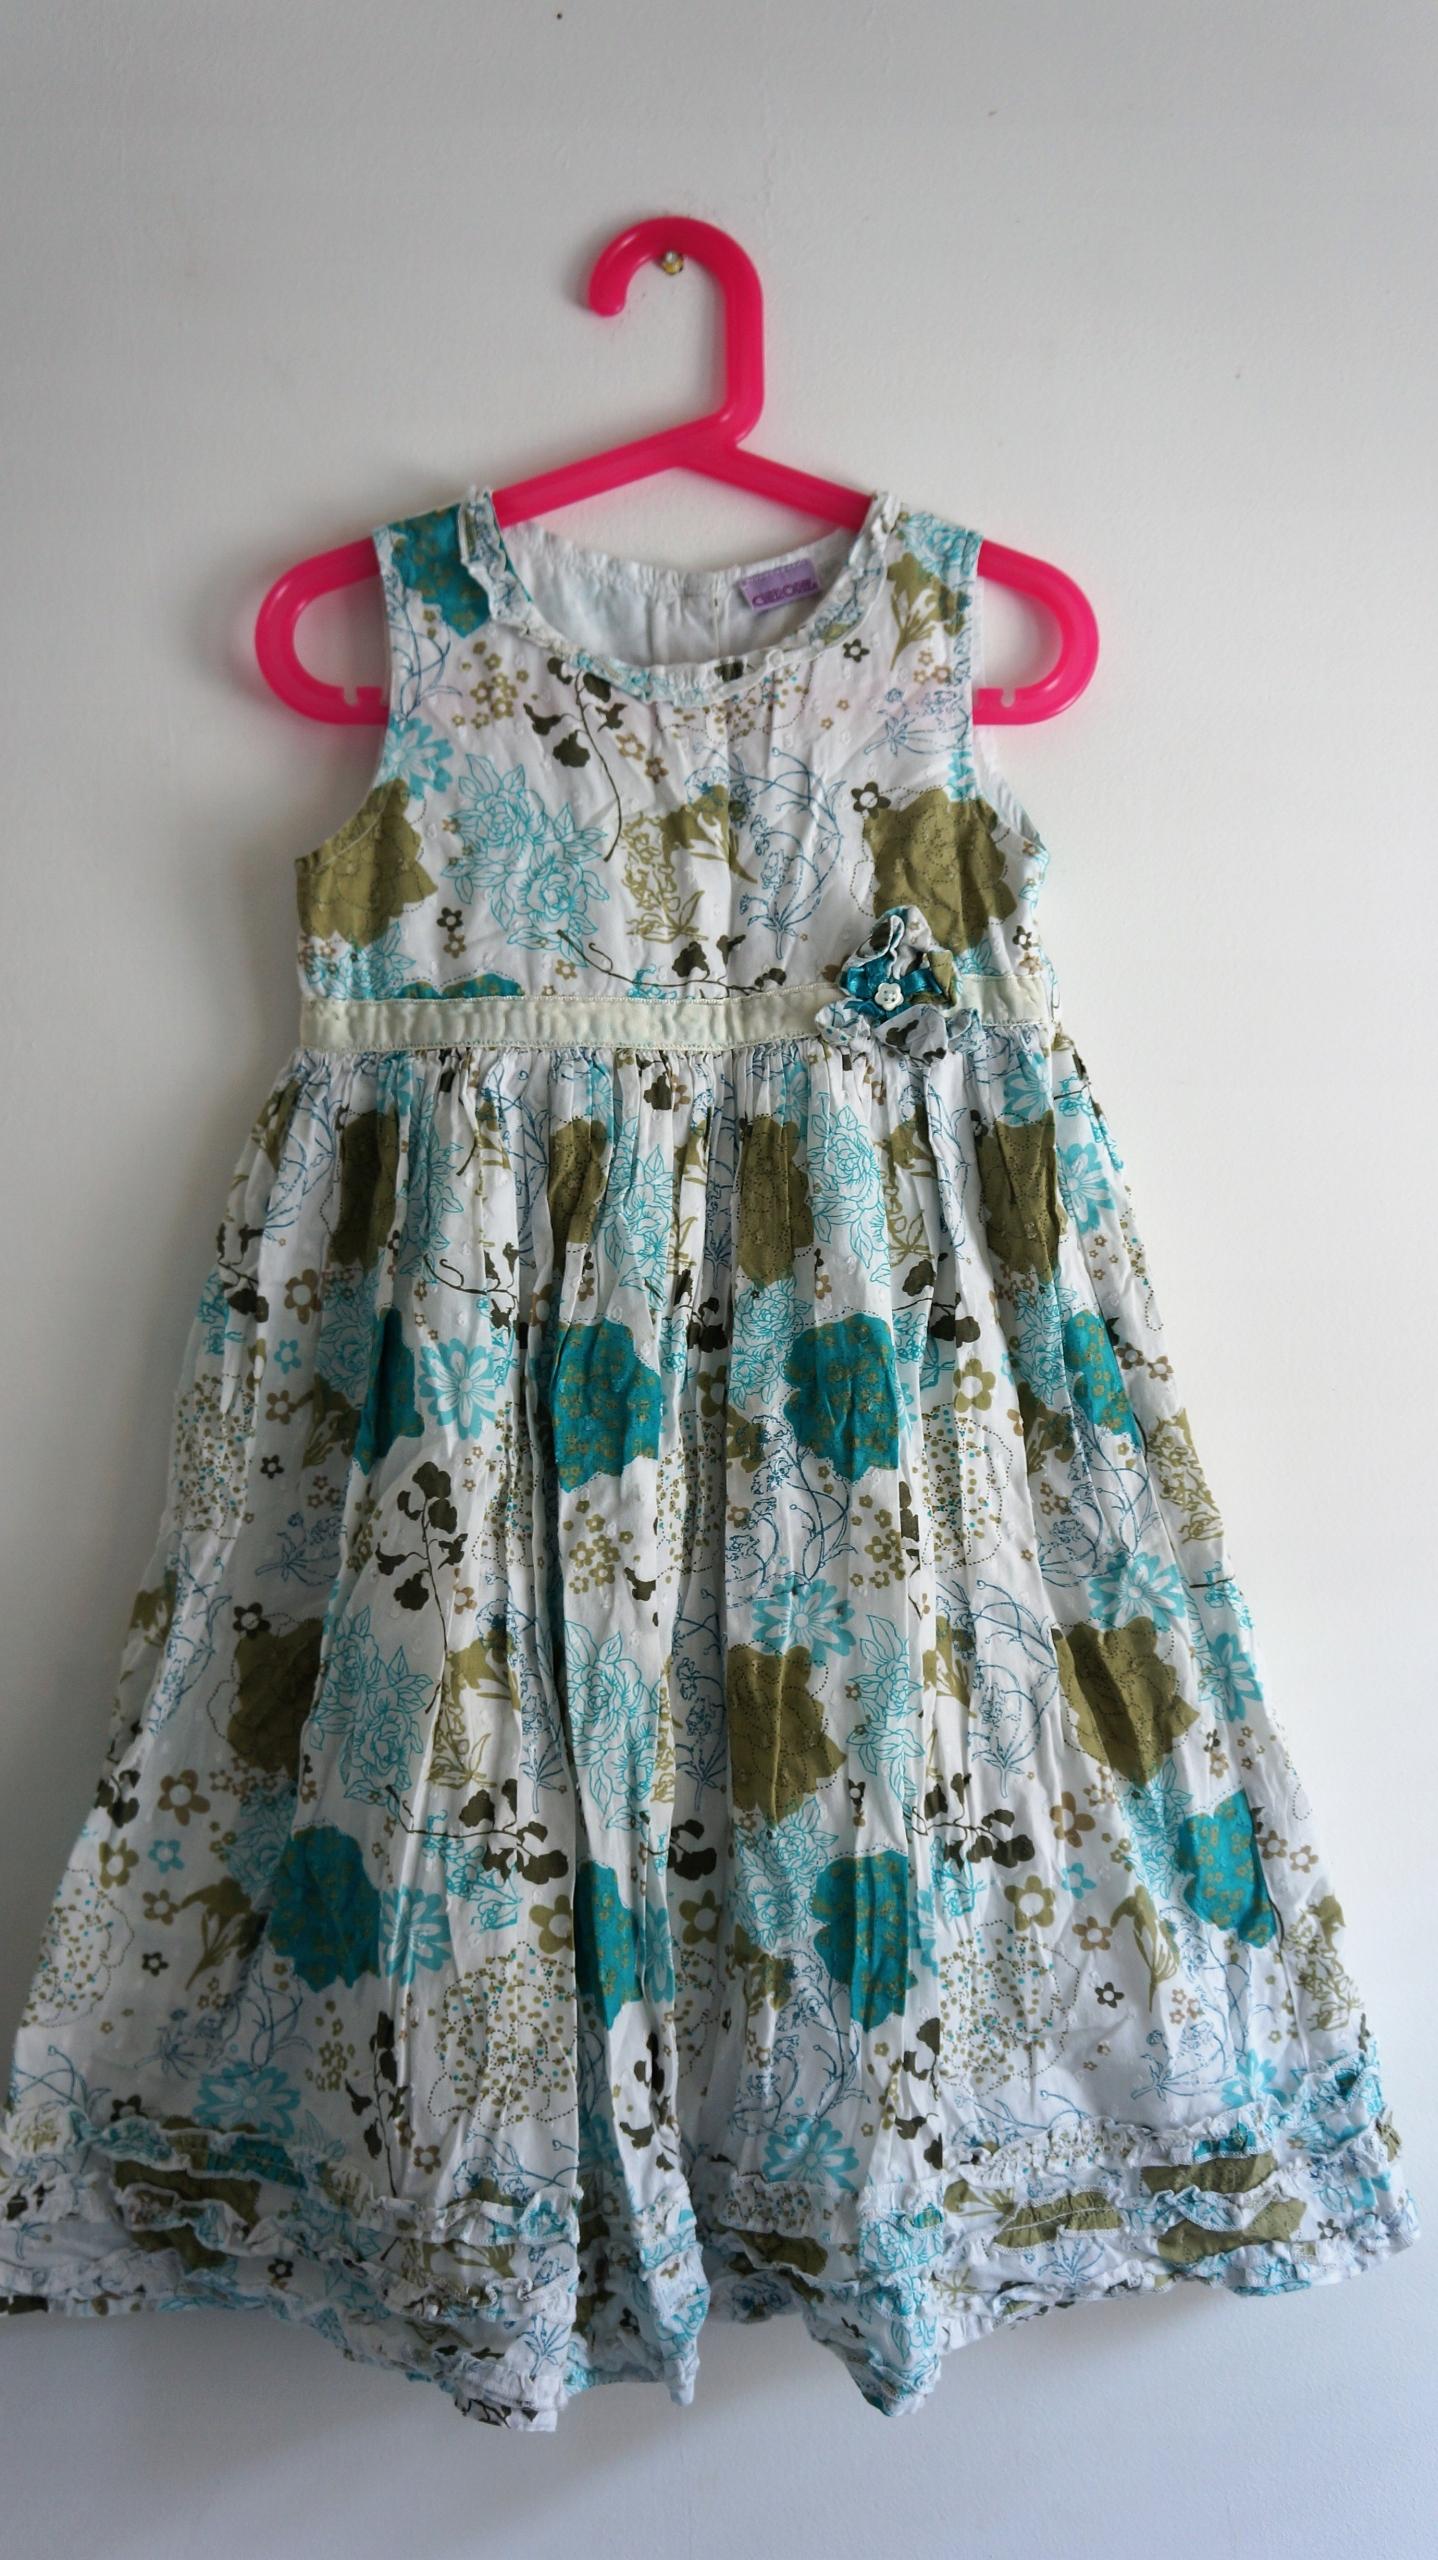 CHEROKEE falbaniasta sukienka w kwiaty 5-6 lat 116